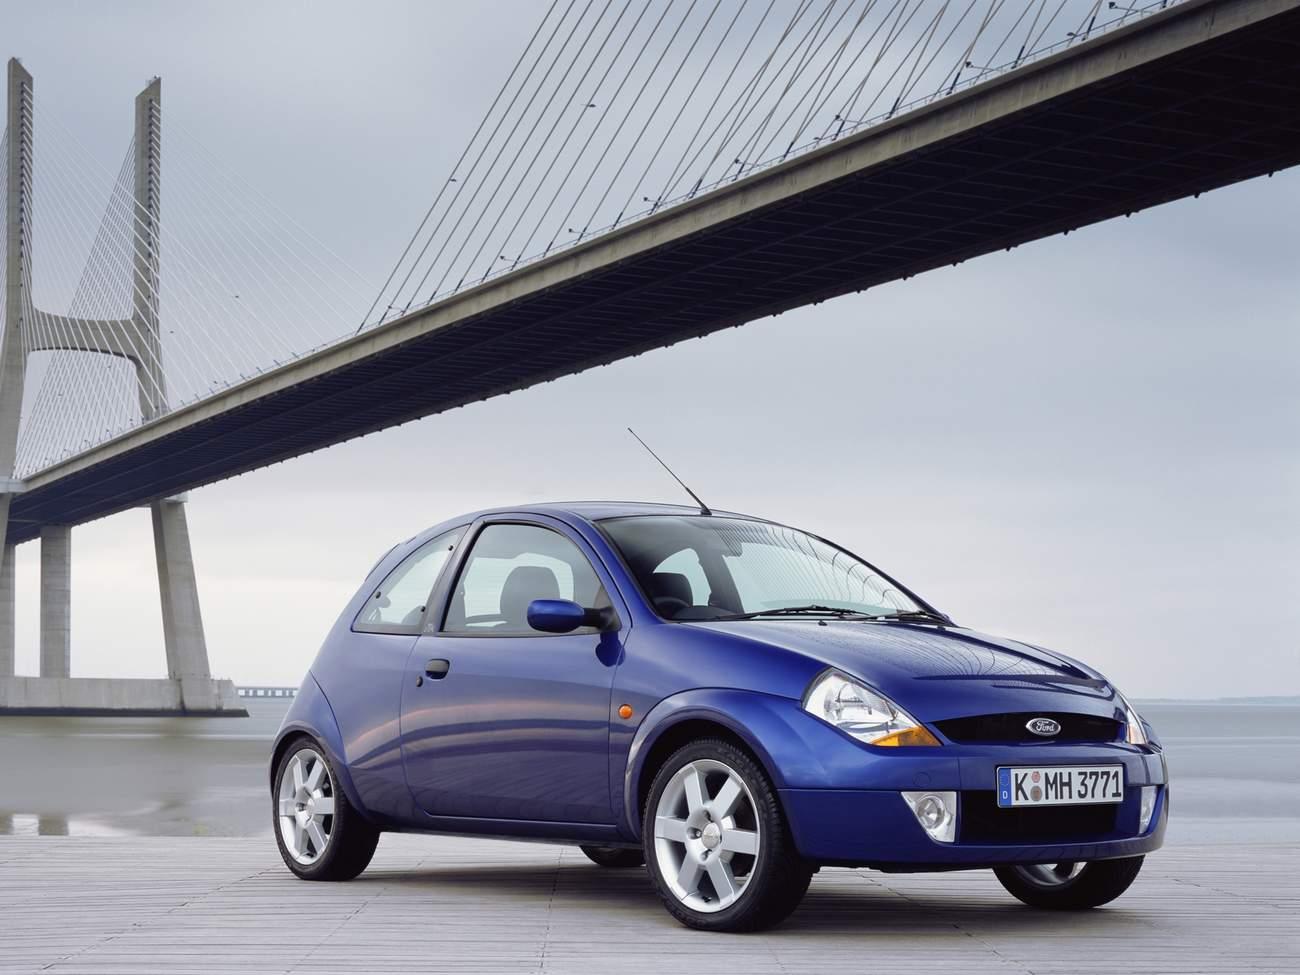 Foto: Ford UK